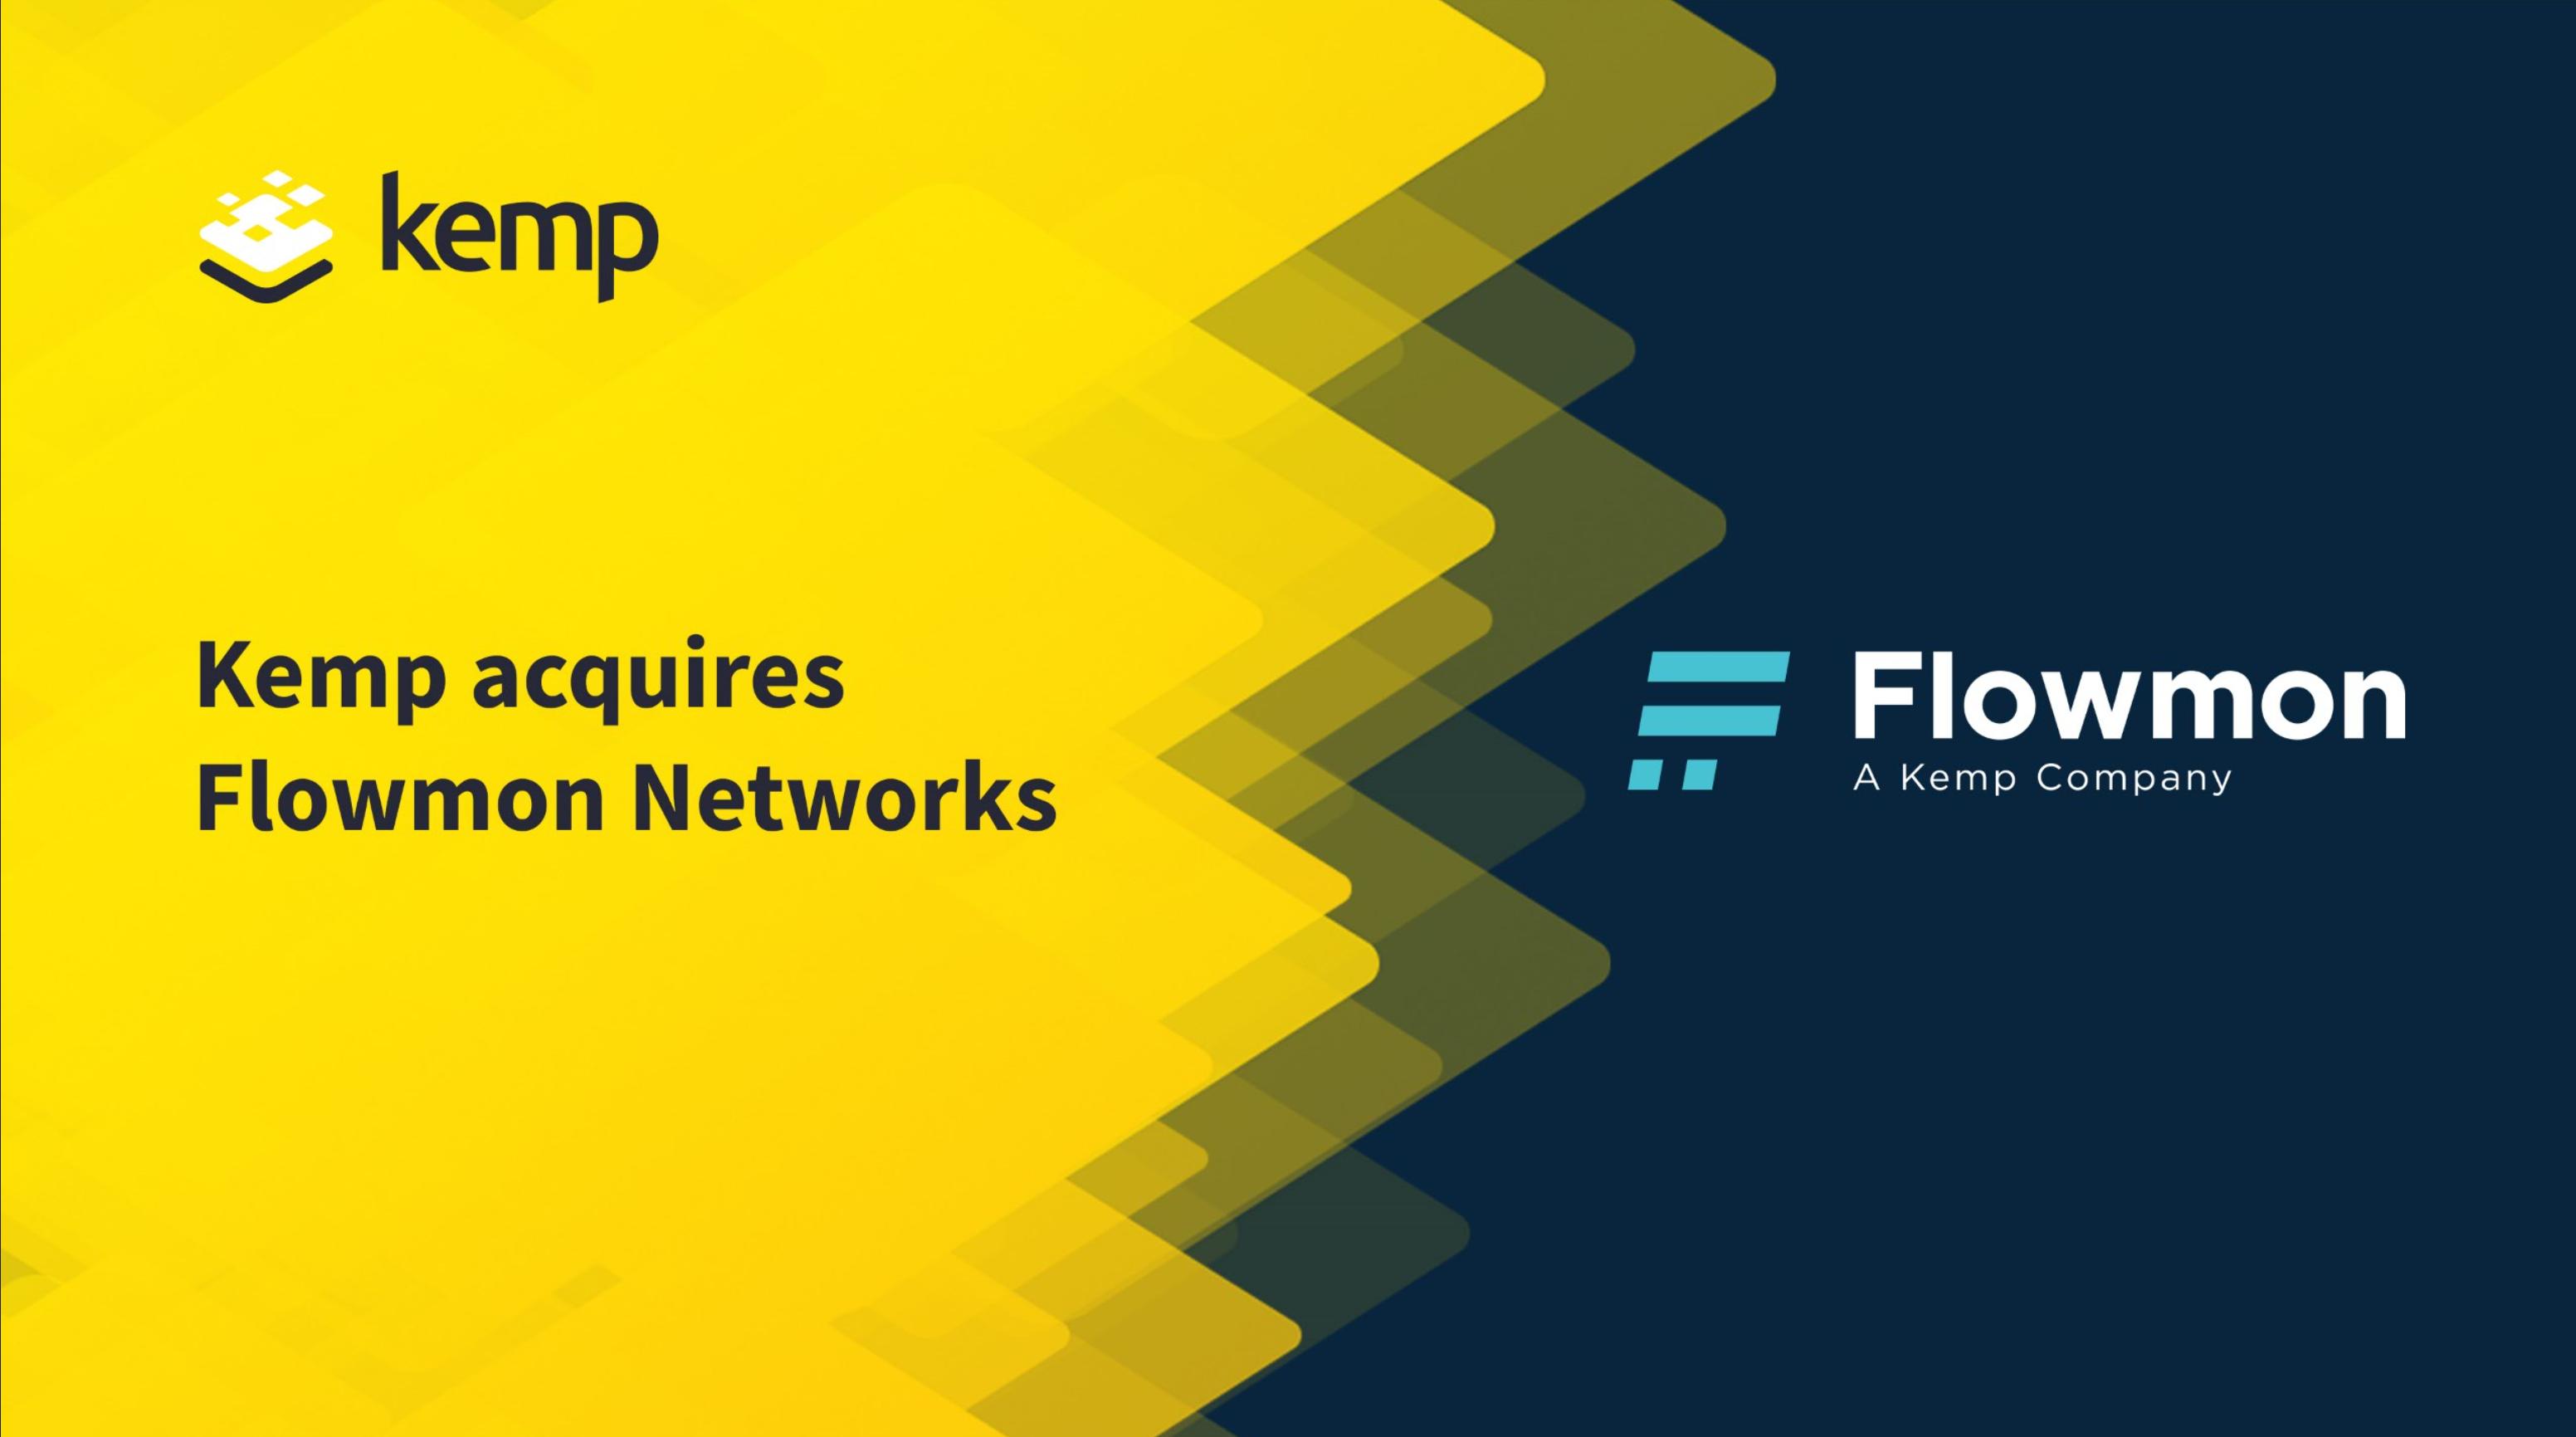 Kemp neemt Flowmon over voor Predictive Network Performance Monitoring en Network Detection & Response (NDR)